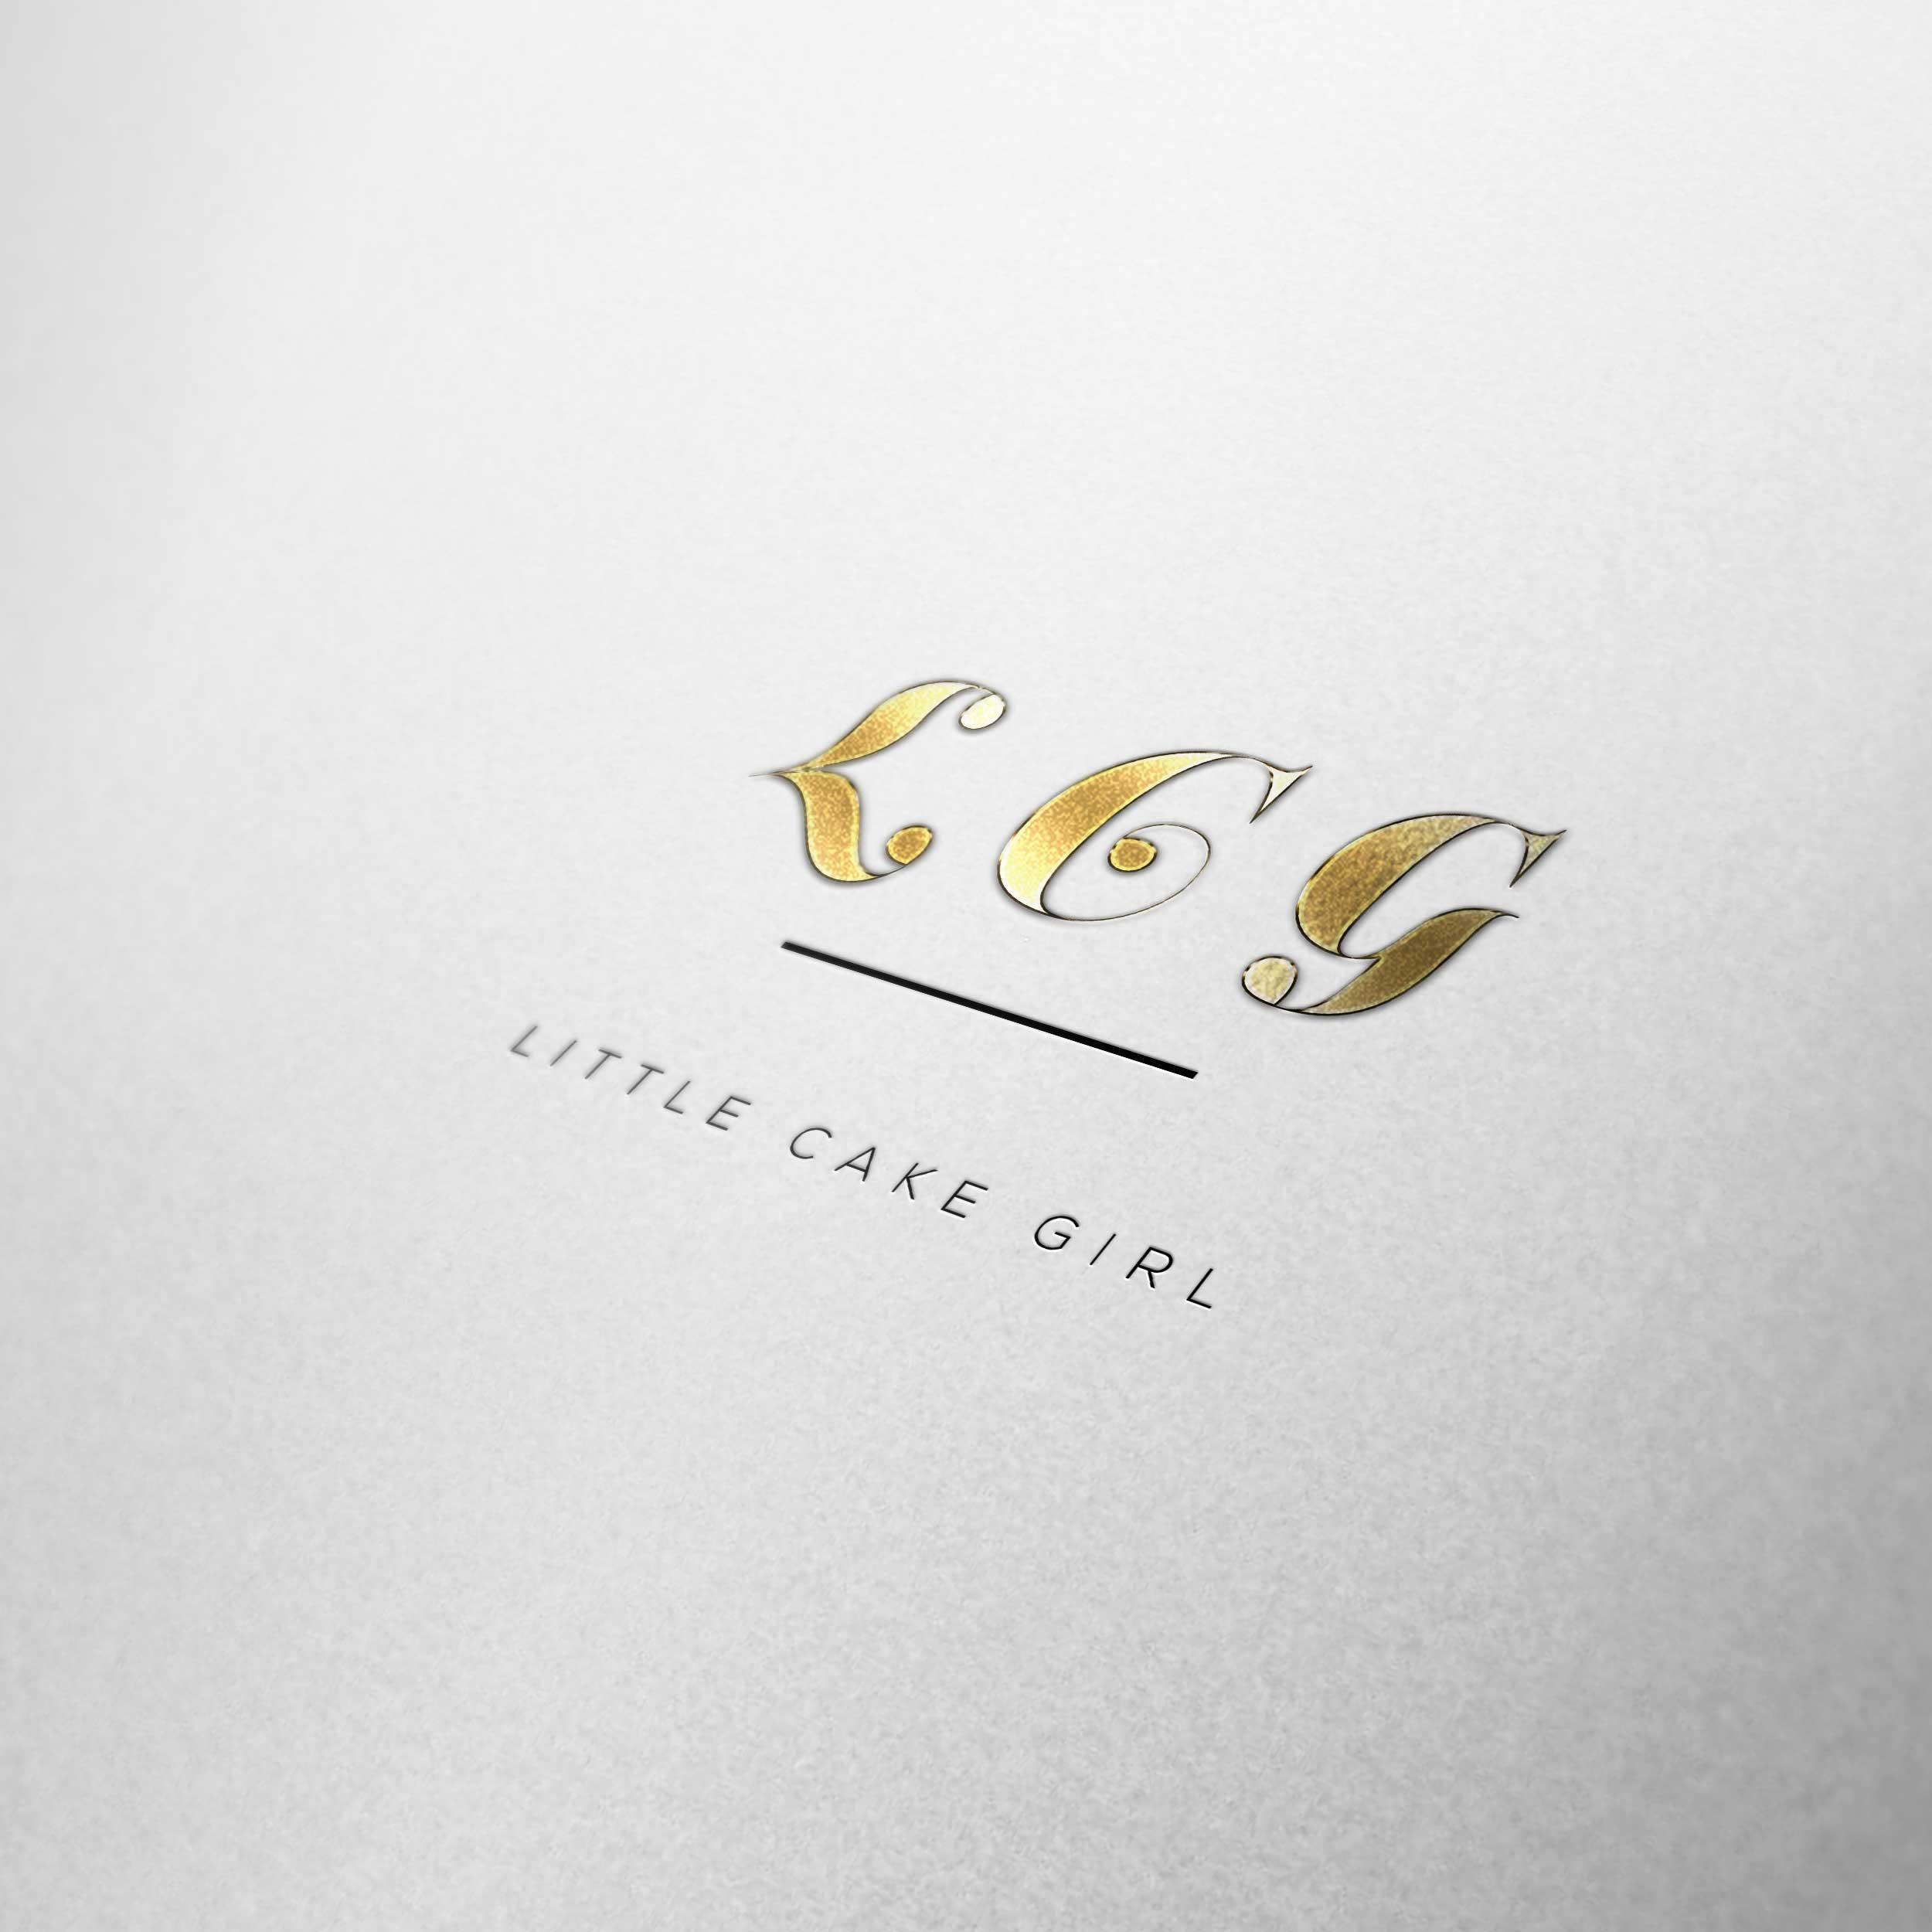 LCG-3-min